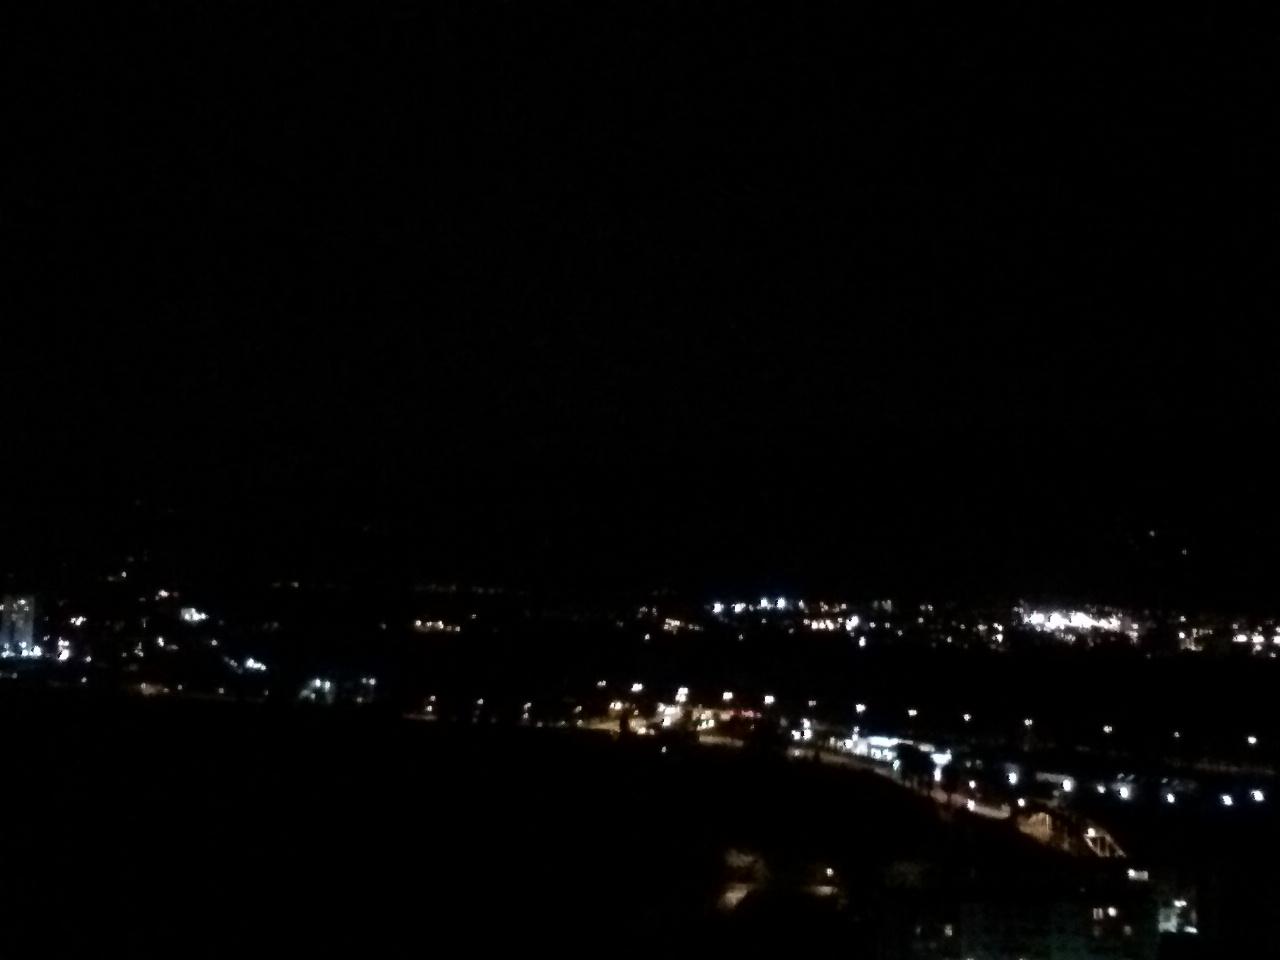 Caméra frontale, nuit